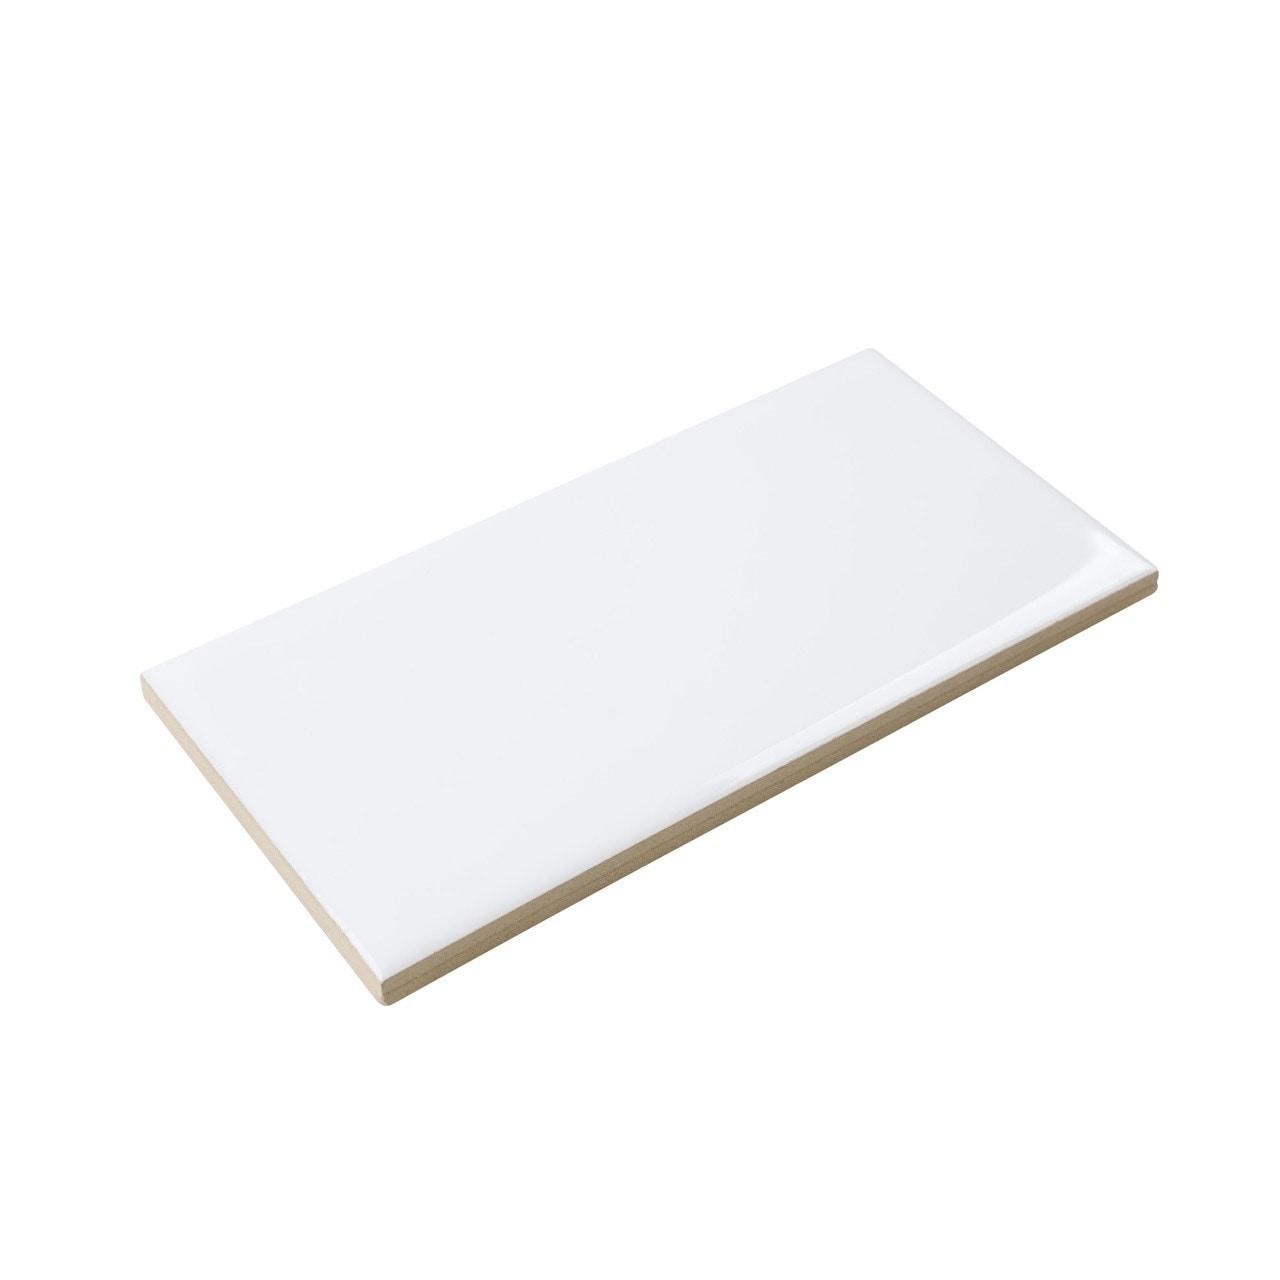 "Ceramic Subway Tile / 3 x 6 x 0.25 inches / Glossy 3"" x 6"" Ceramic Tile in Bright White 0"